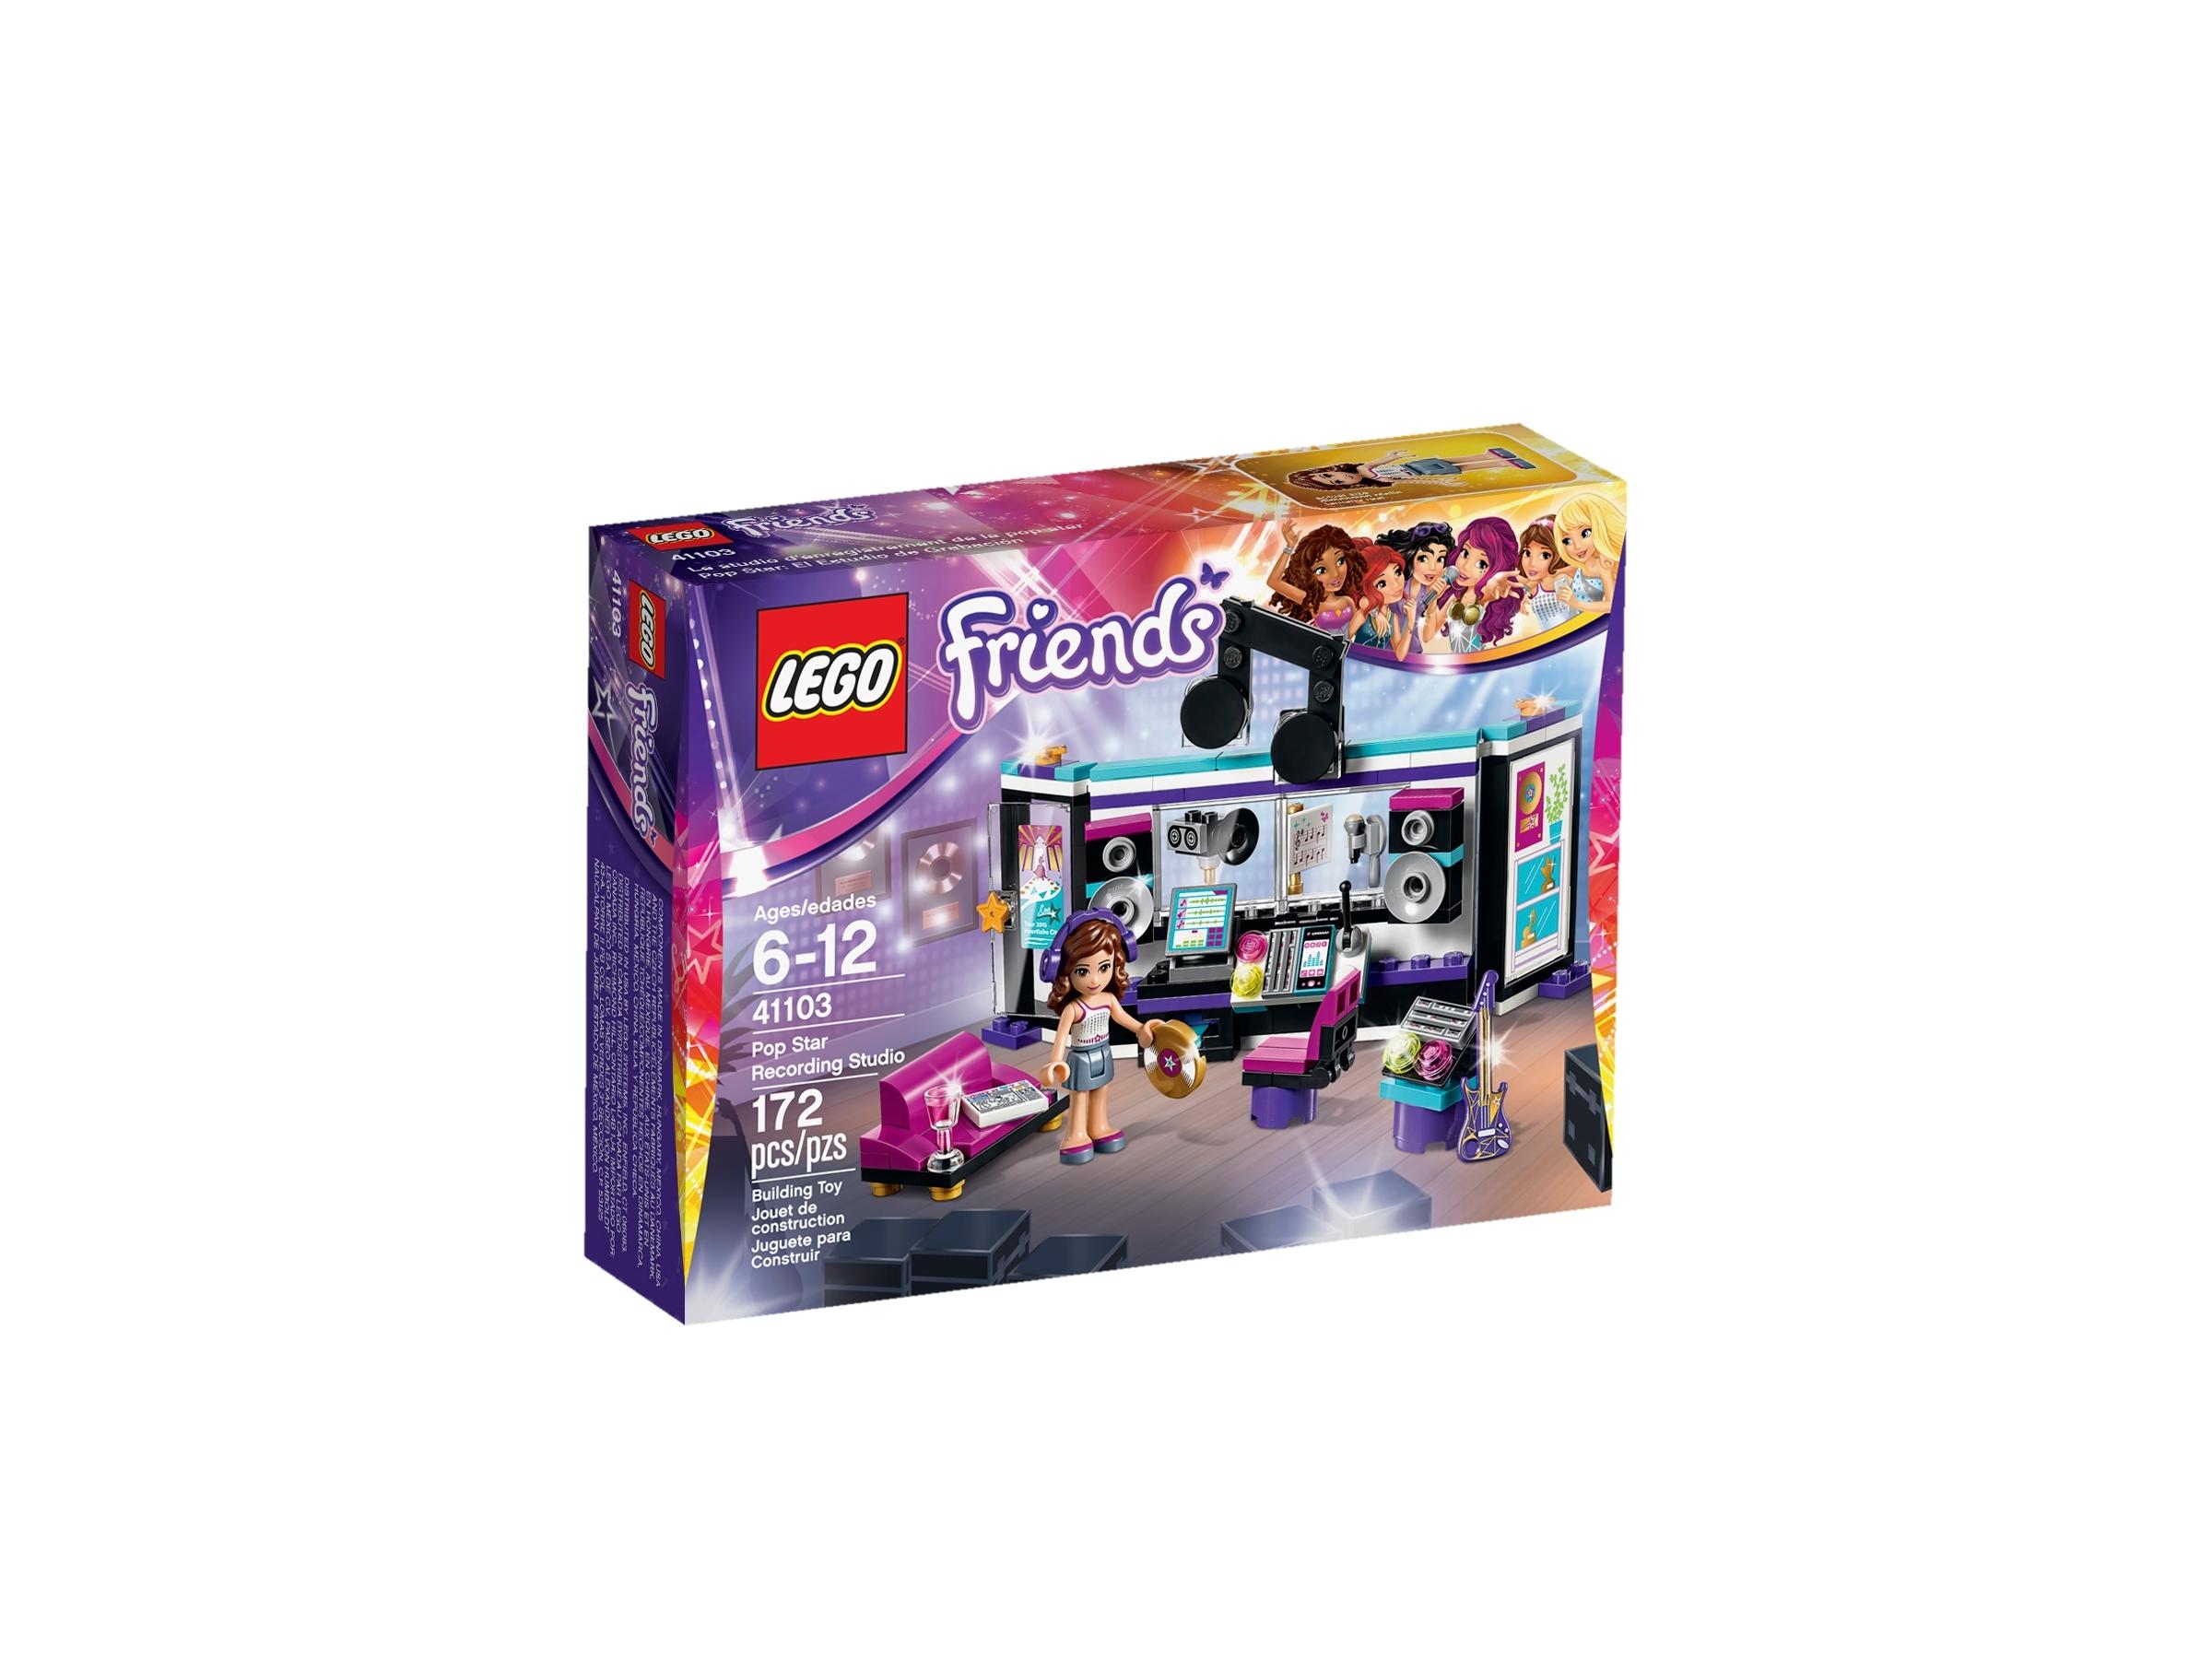 LEGO 41103 Friends Pop Star Recording Studio